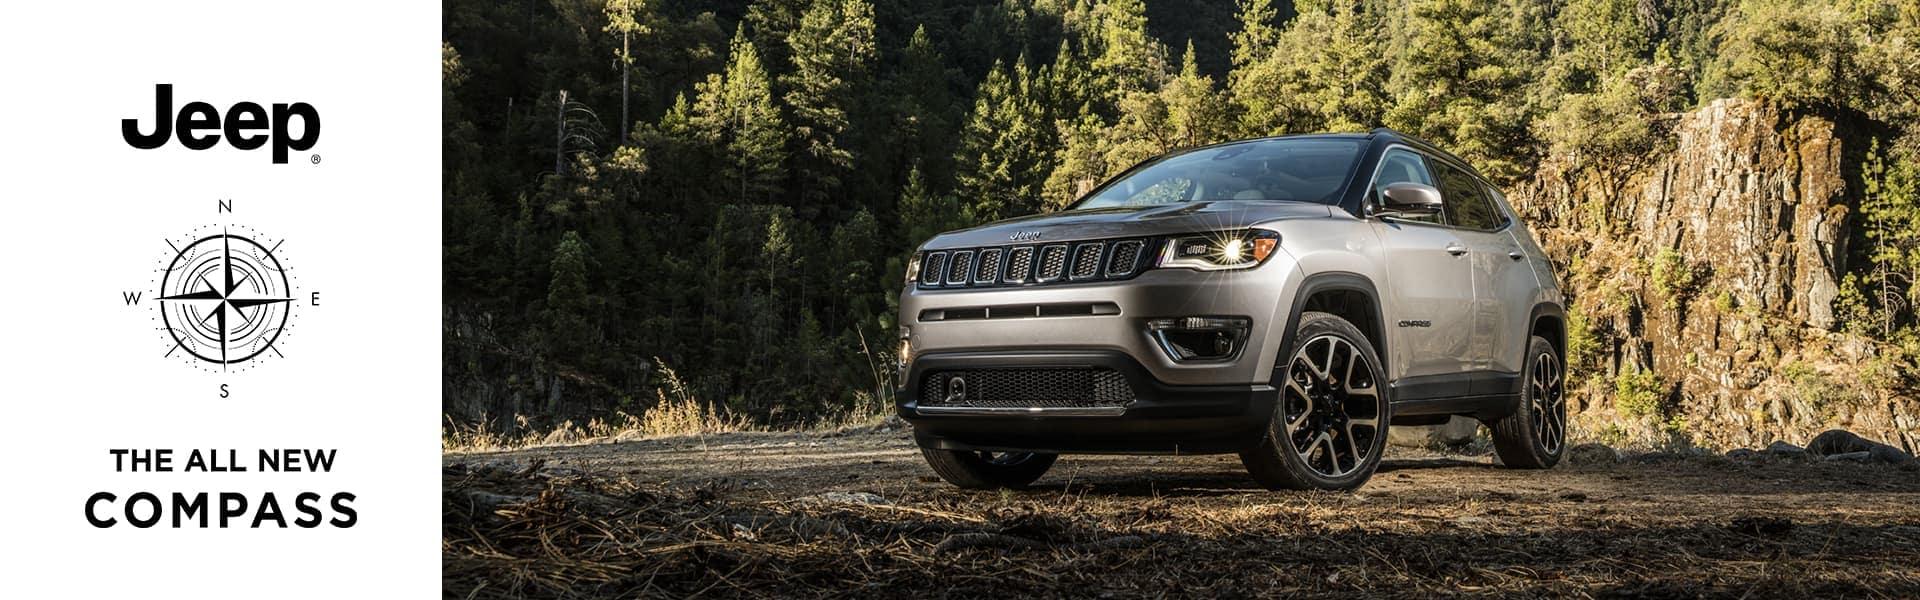 jeep-desktop